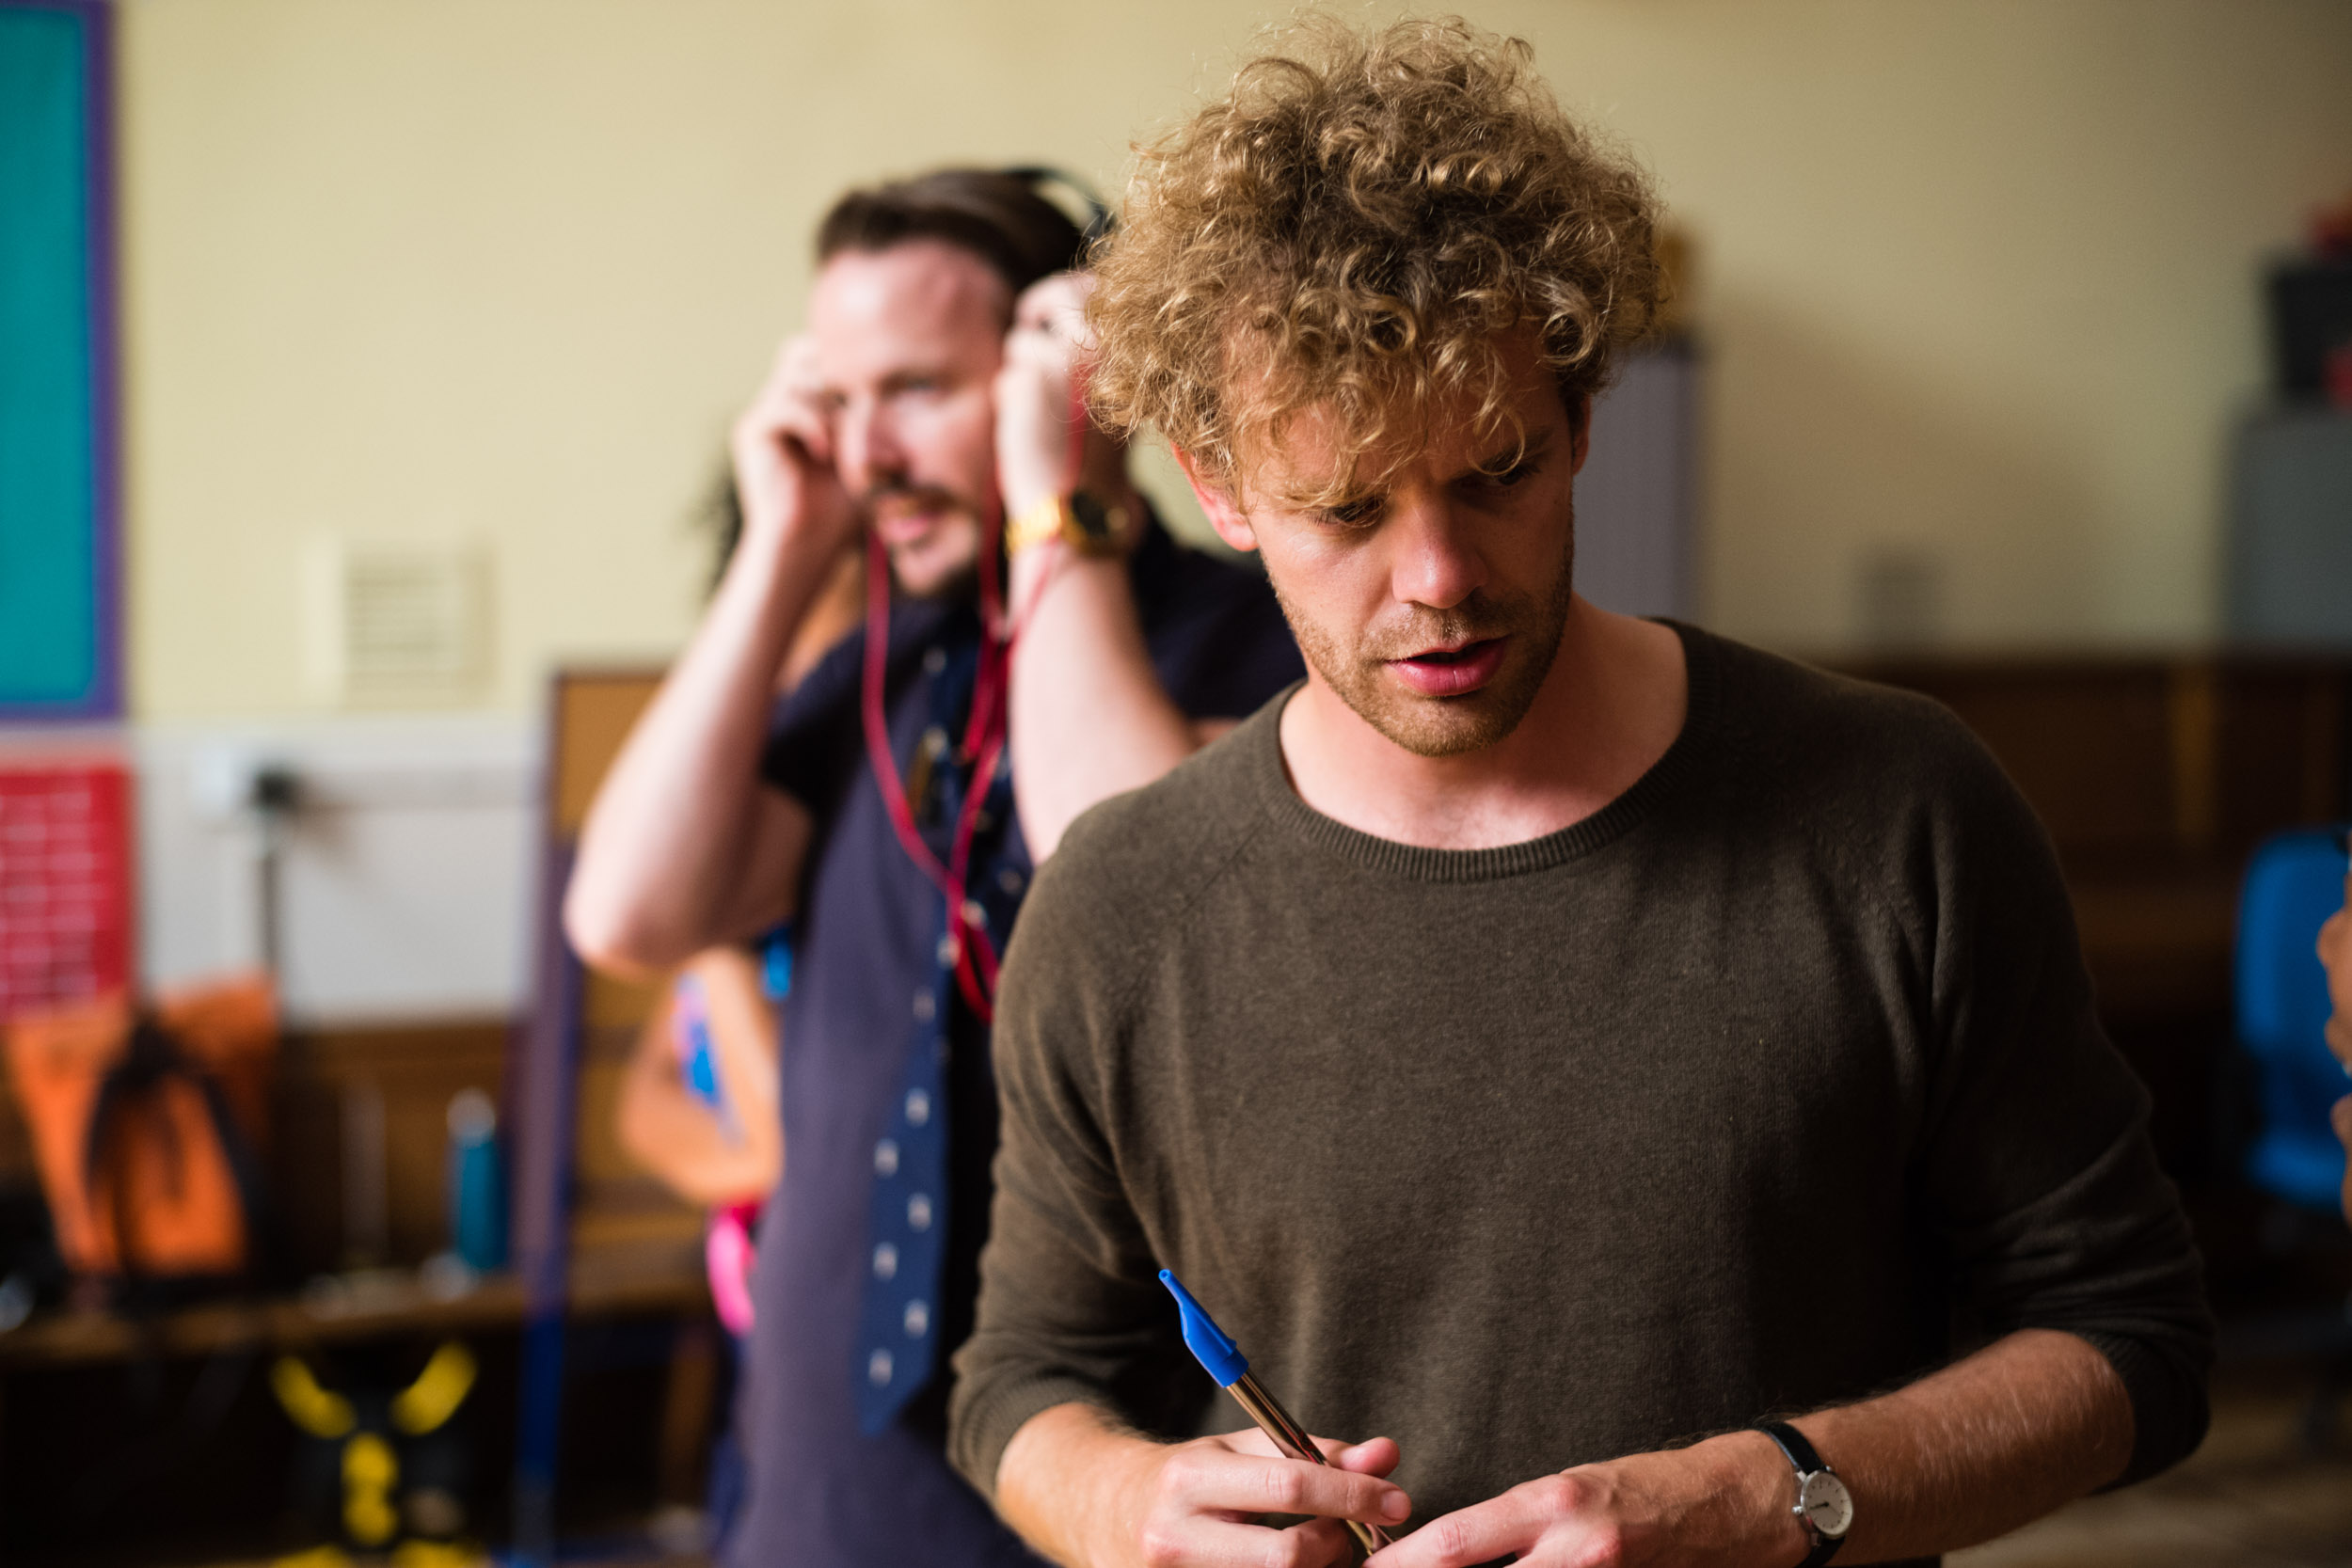 From Left: Tom Stoddart (Papageno), Peter Kirk (Tamino)